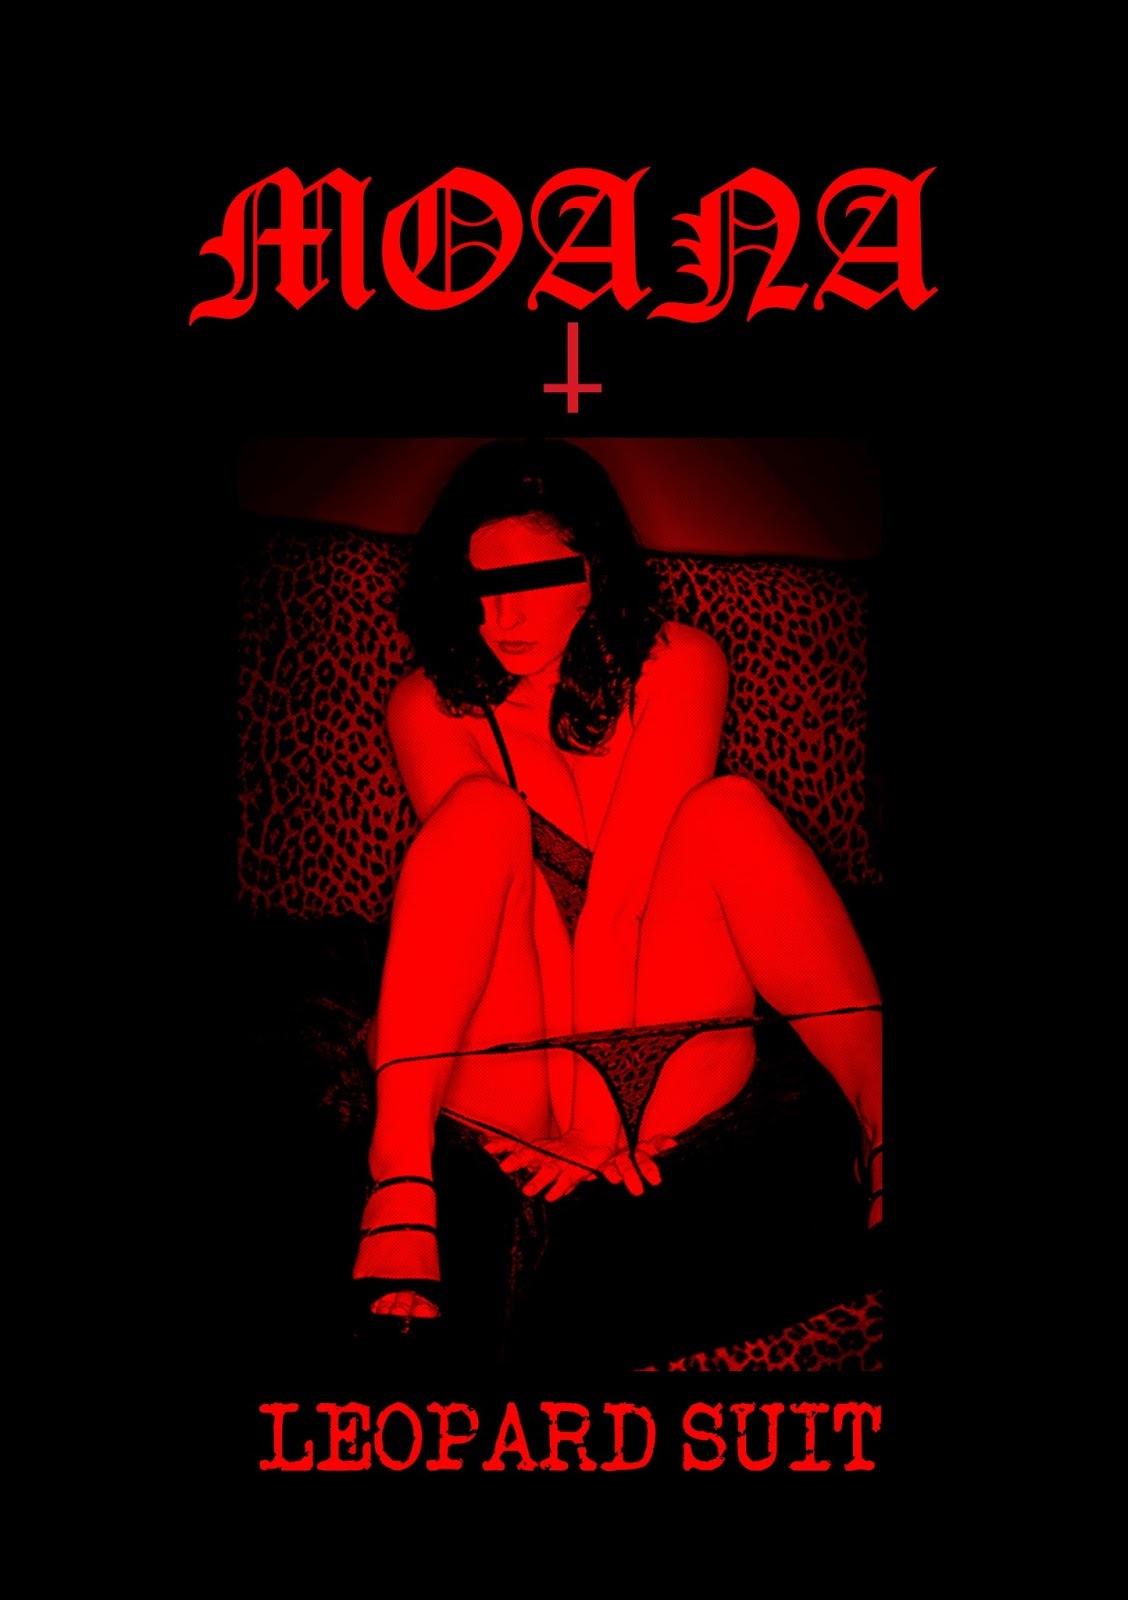 MOANA - LEOPARD SUIT  Tape - 画像1